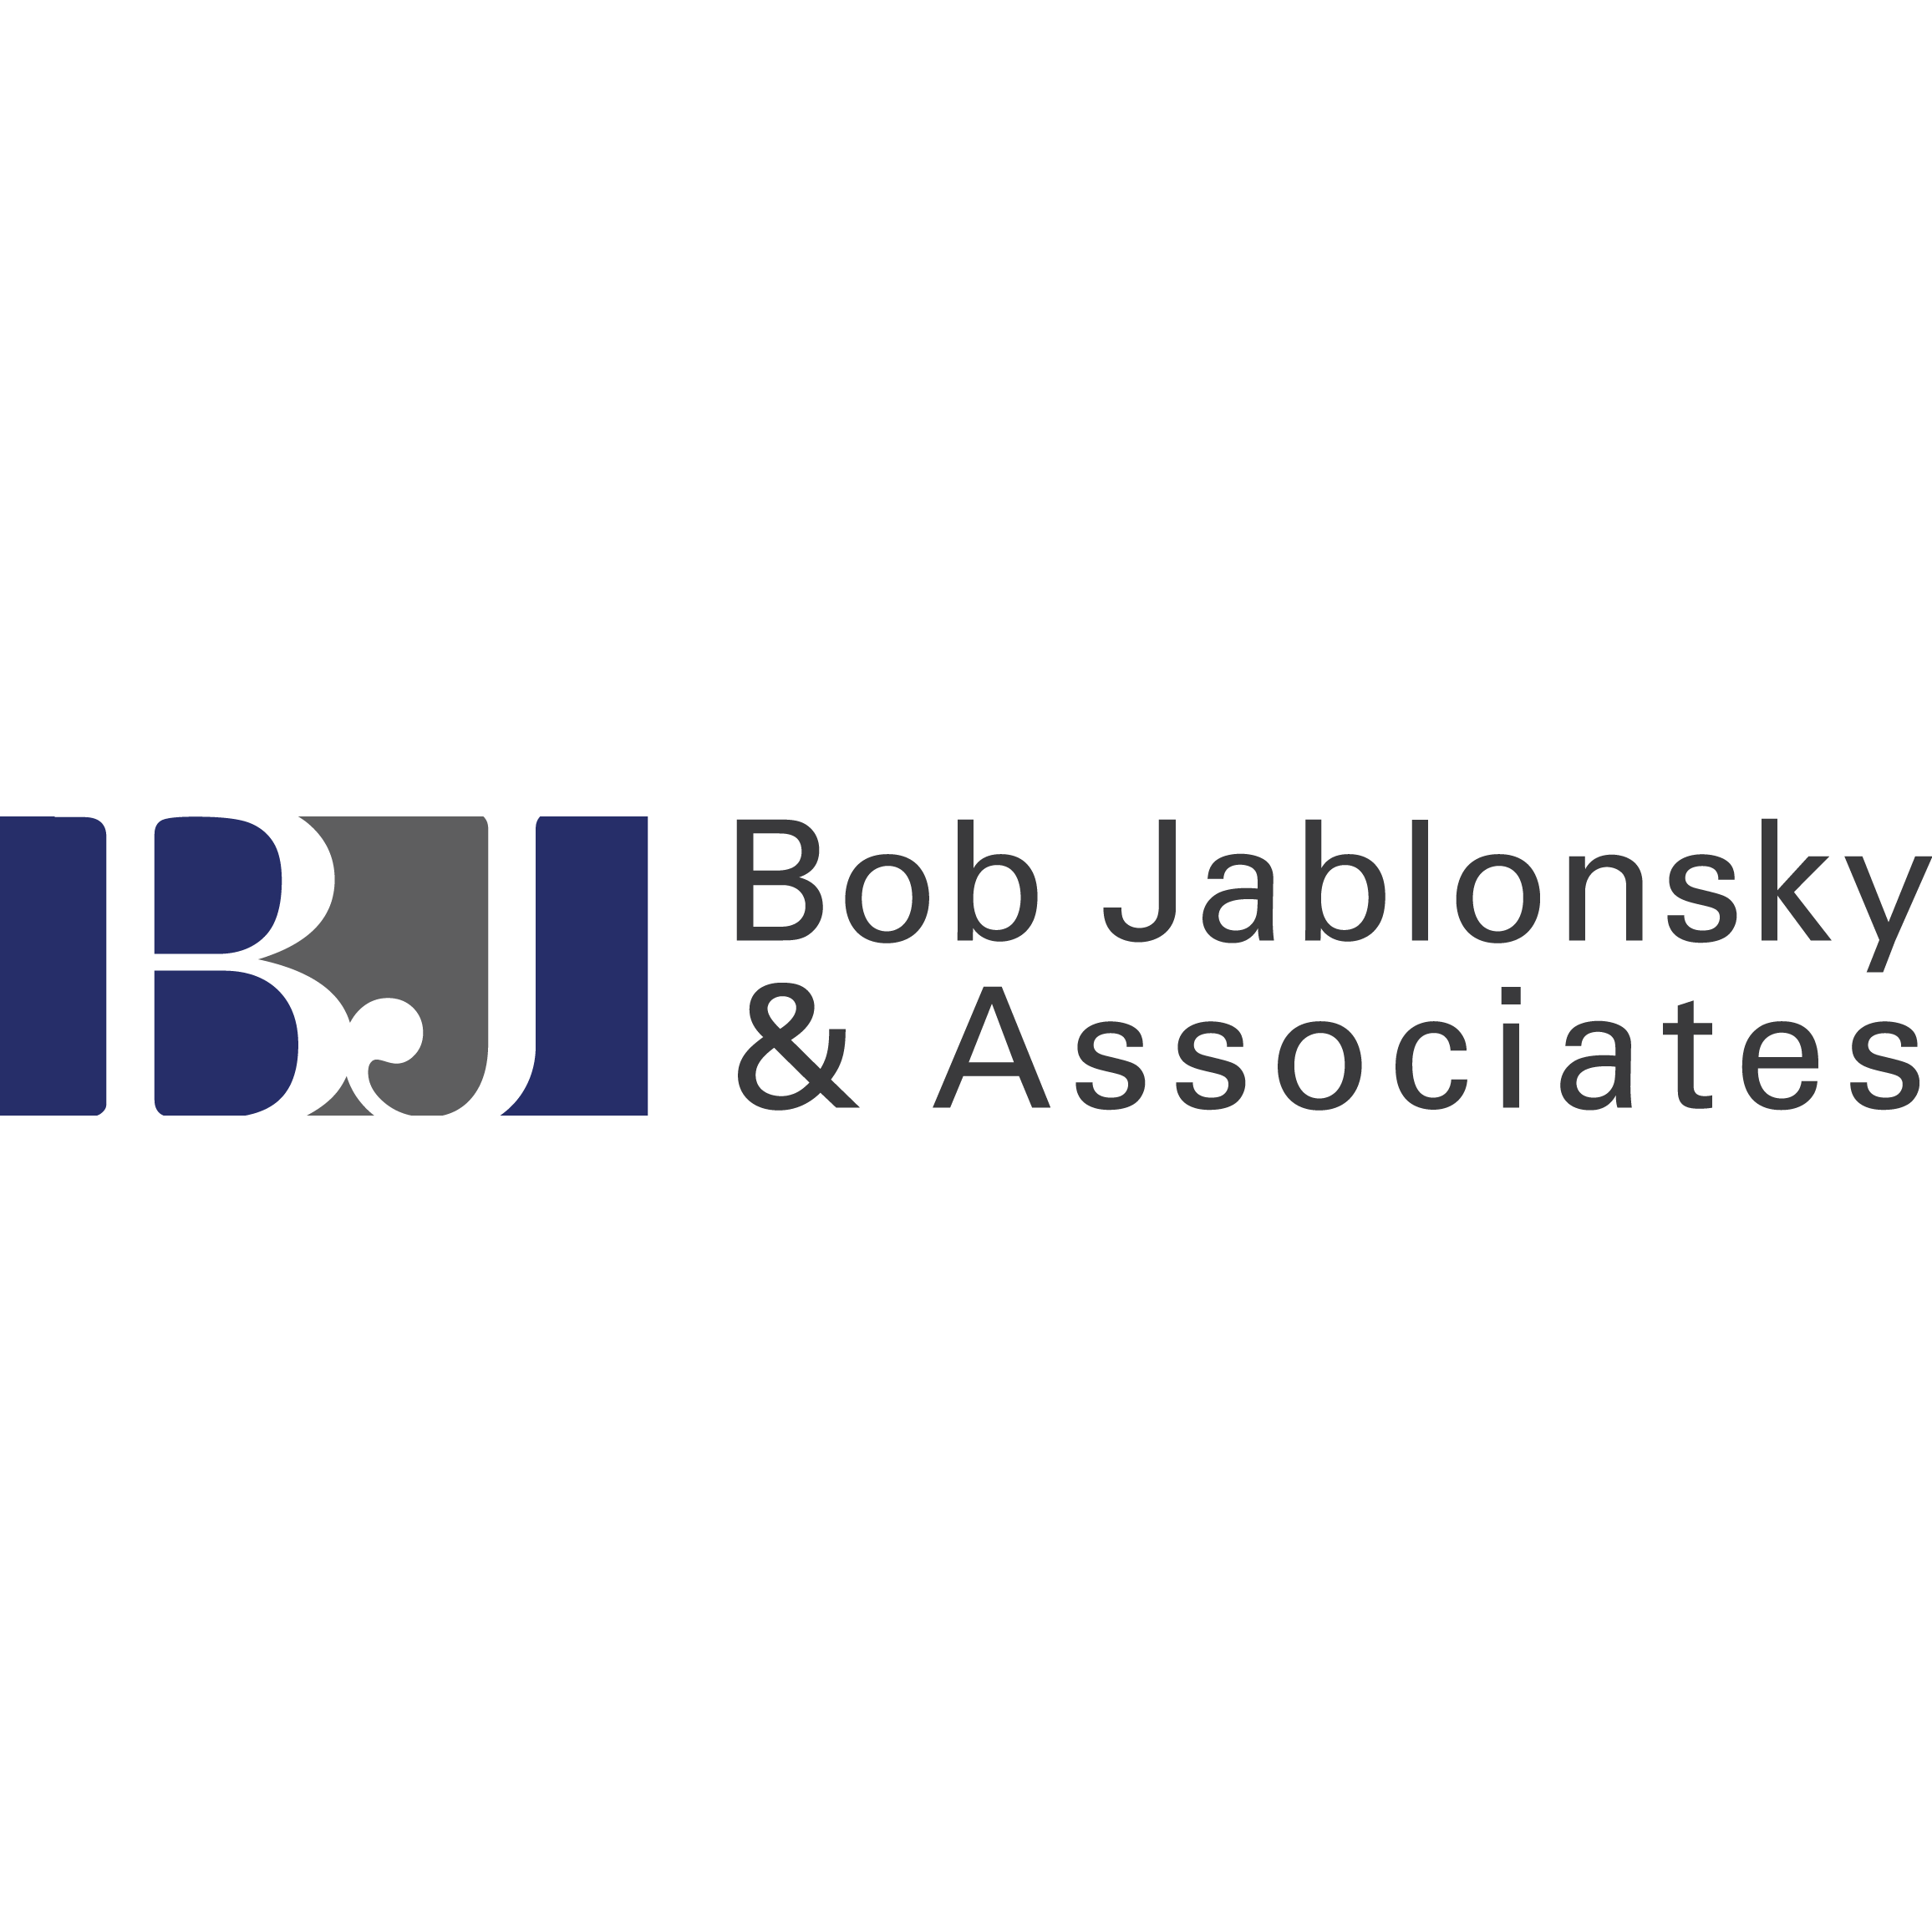 Bob Jablonsky and Associates image 0